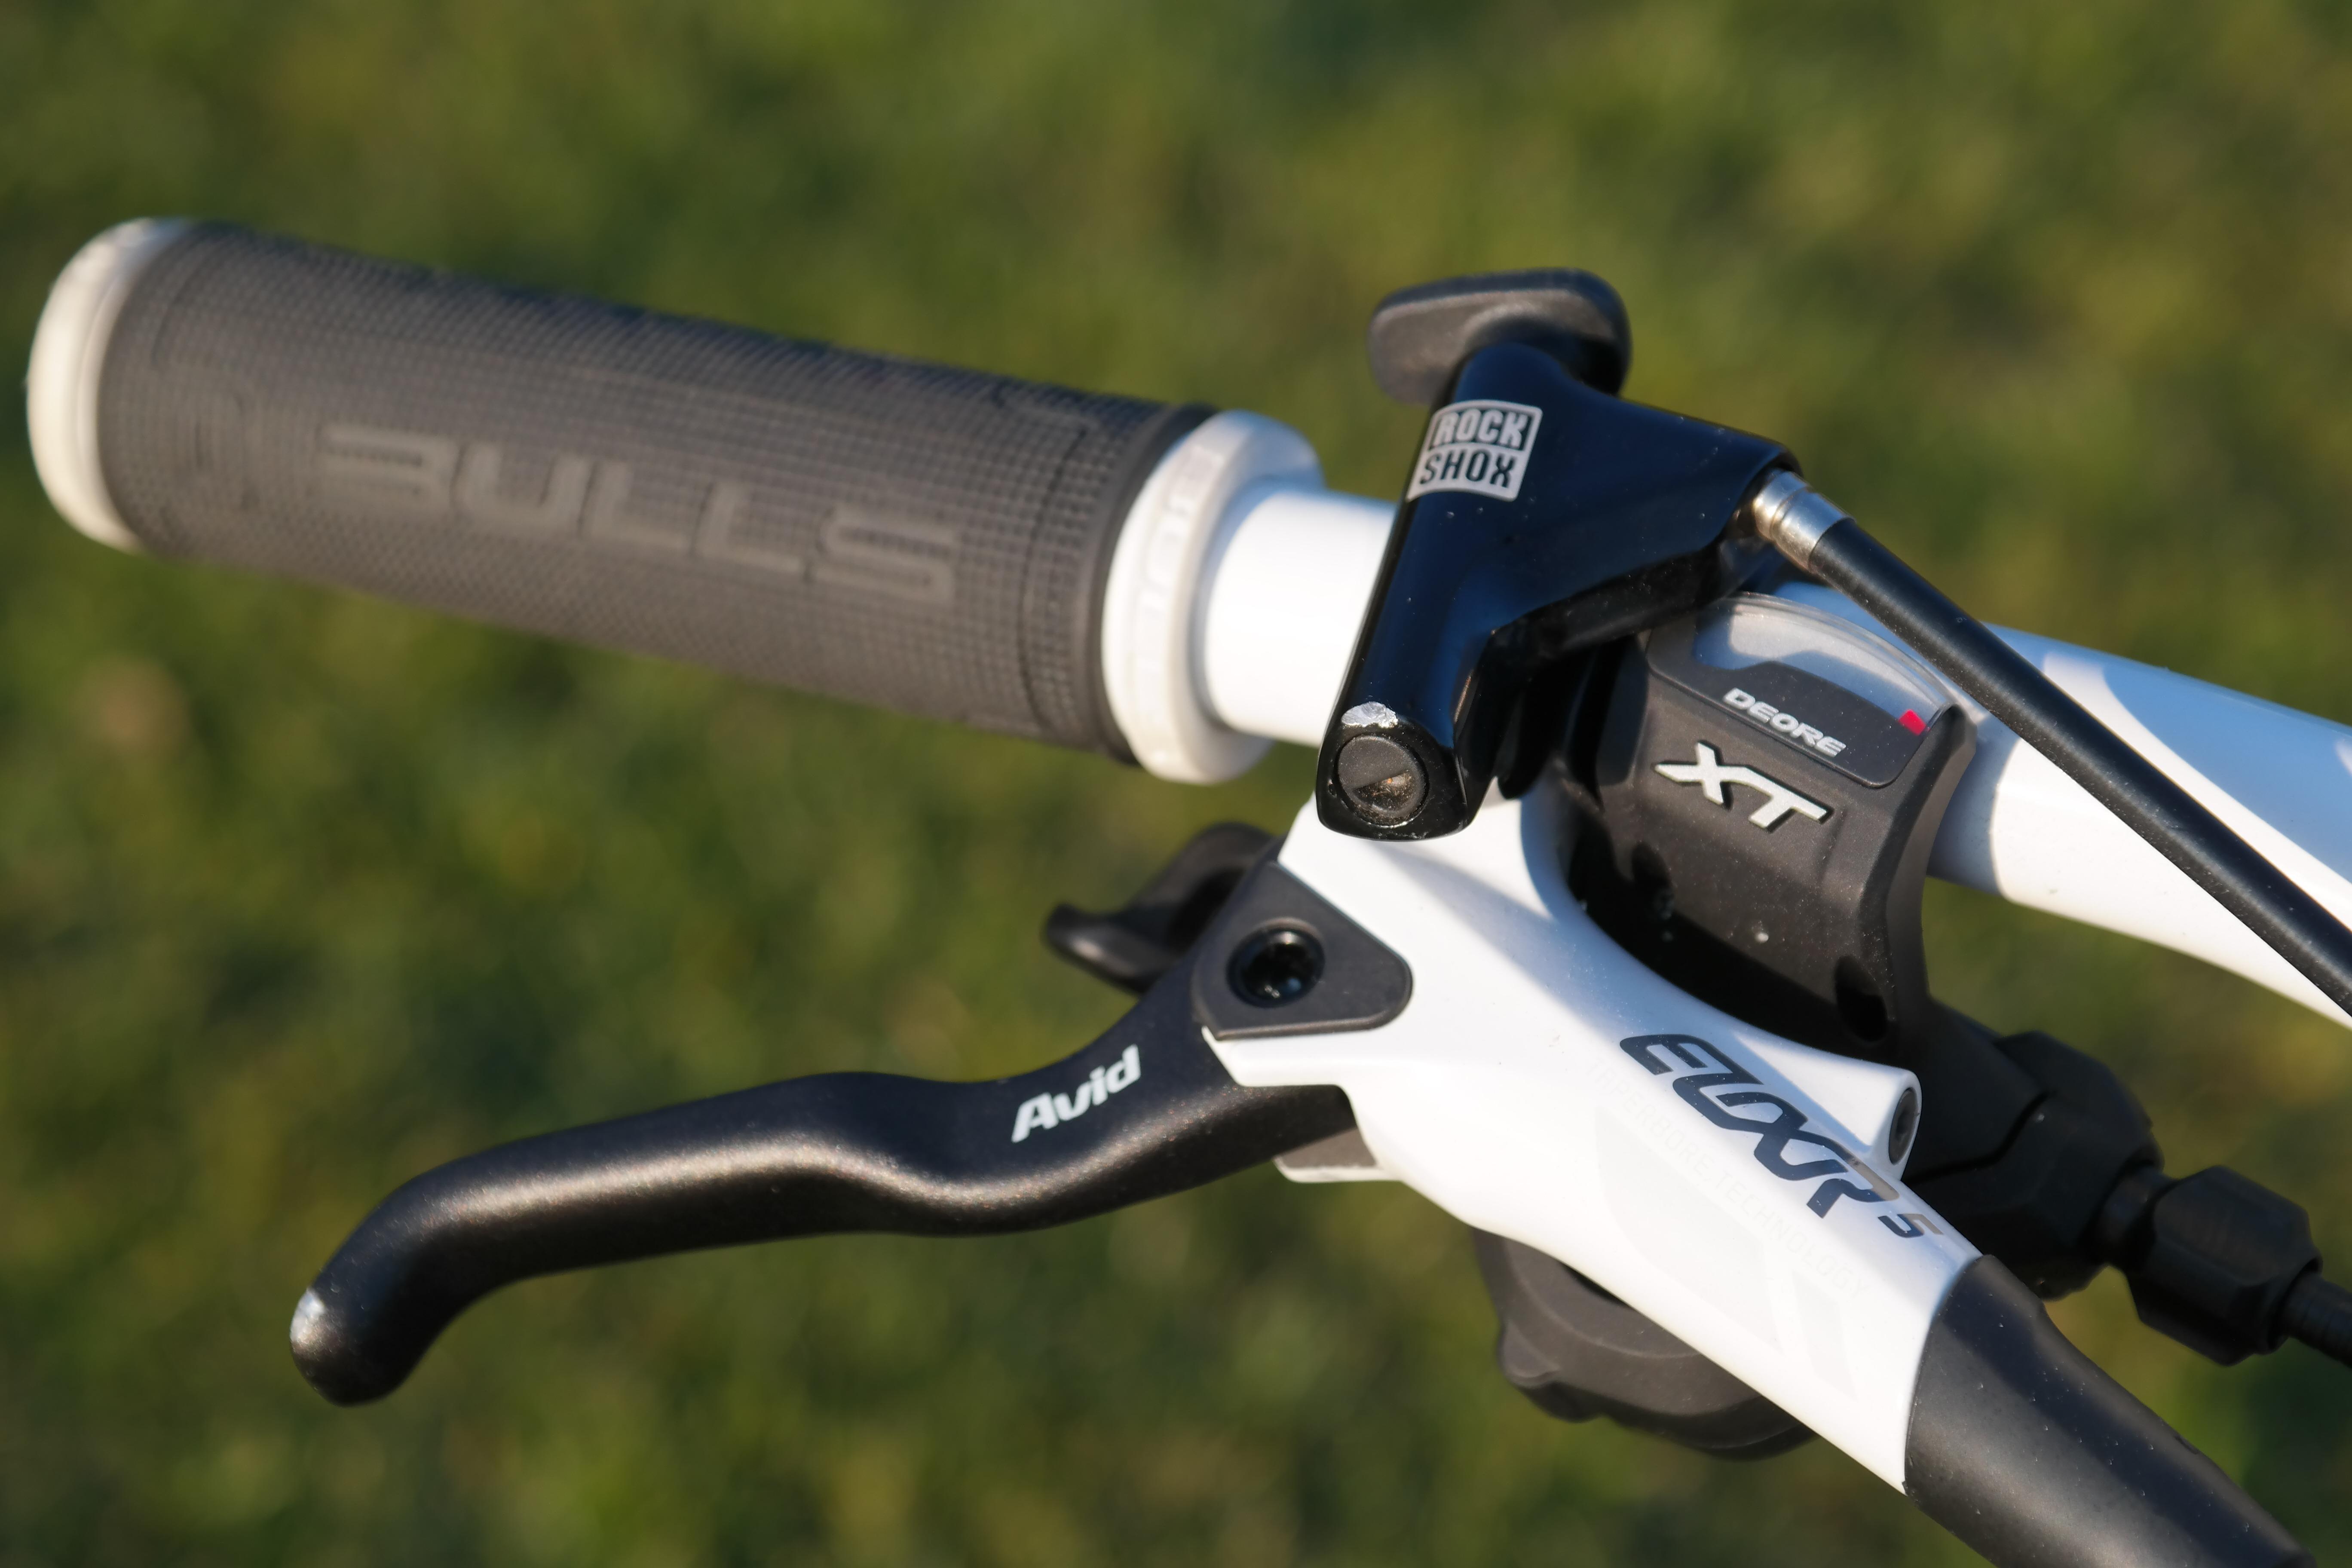 Locking Lever Handle Bar : Free images wheel vehicle handle sports equipment